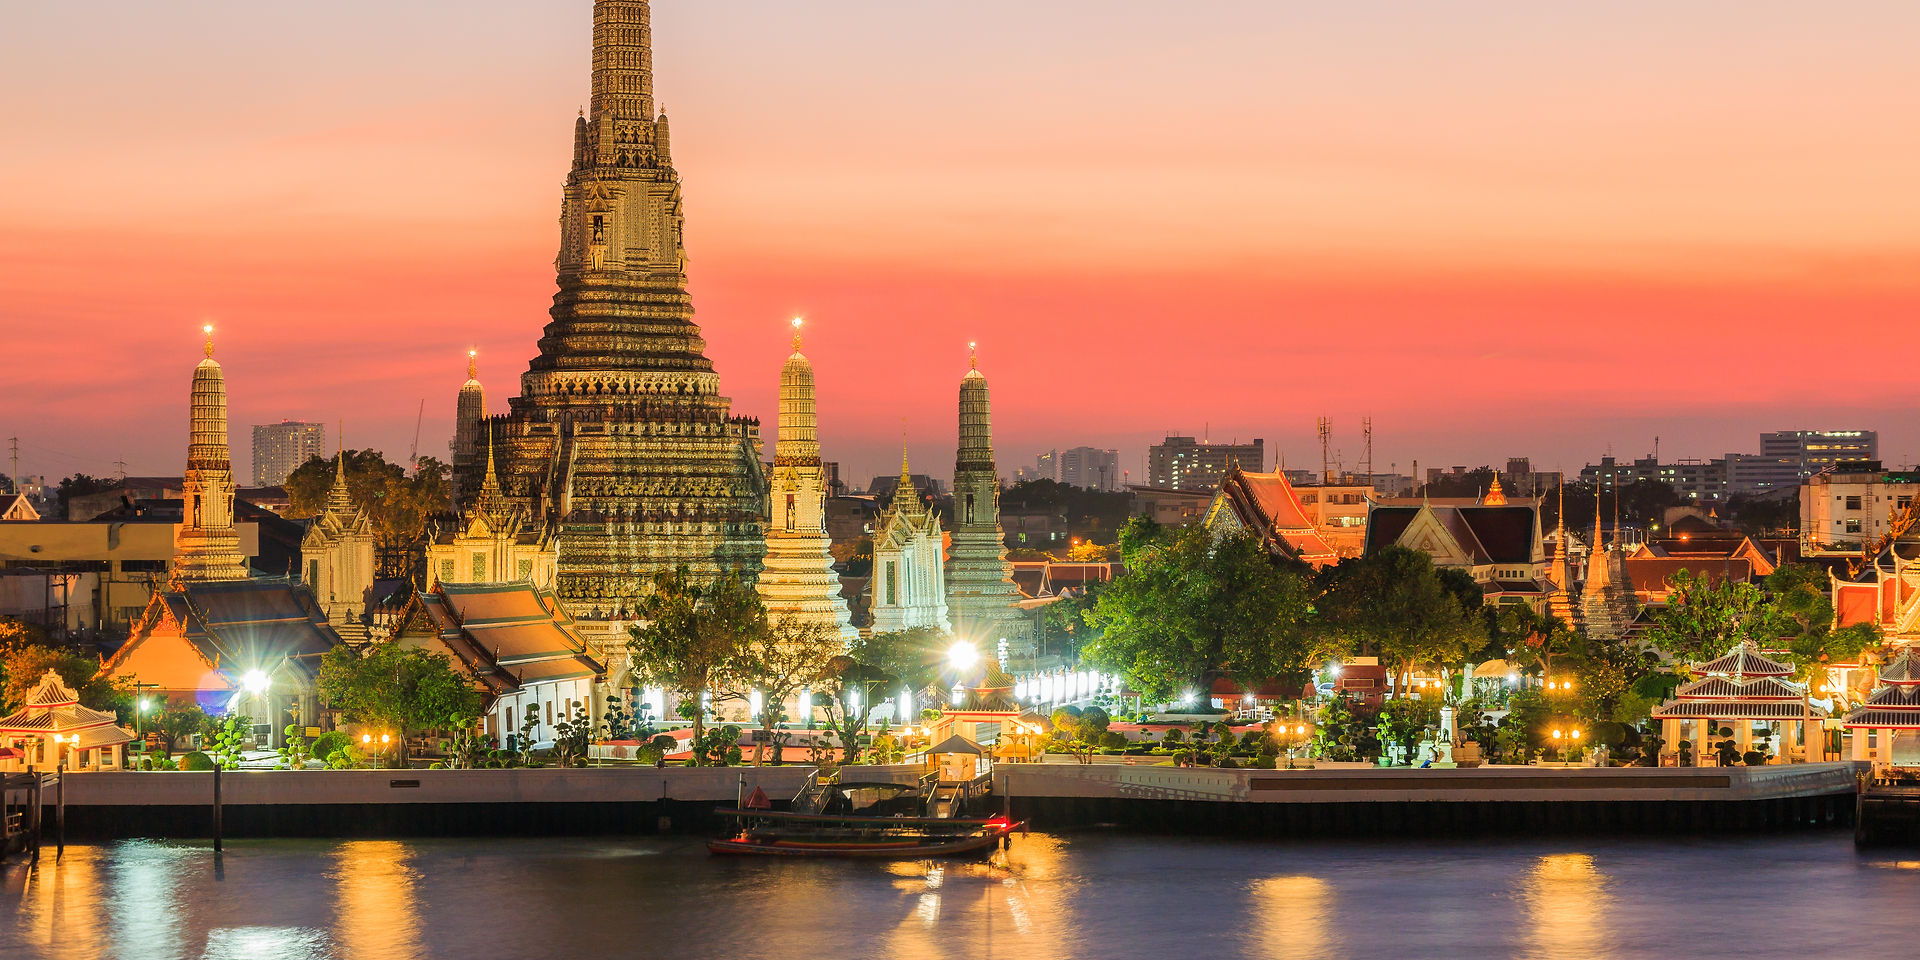 Bankok,Thailand.Wat Arun temple at sunse